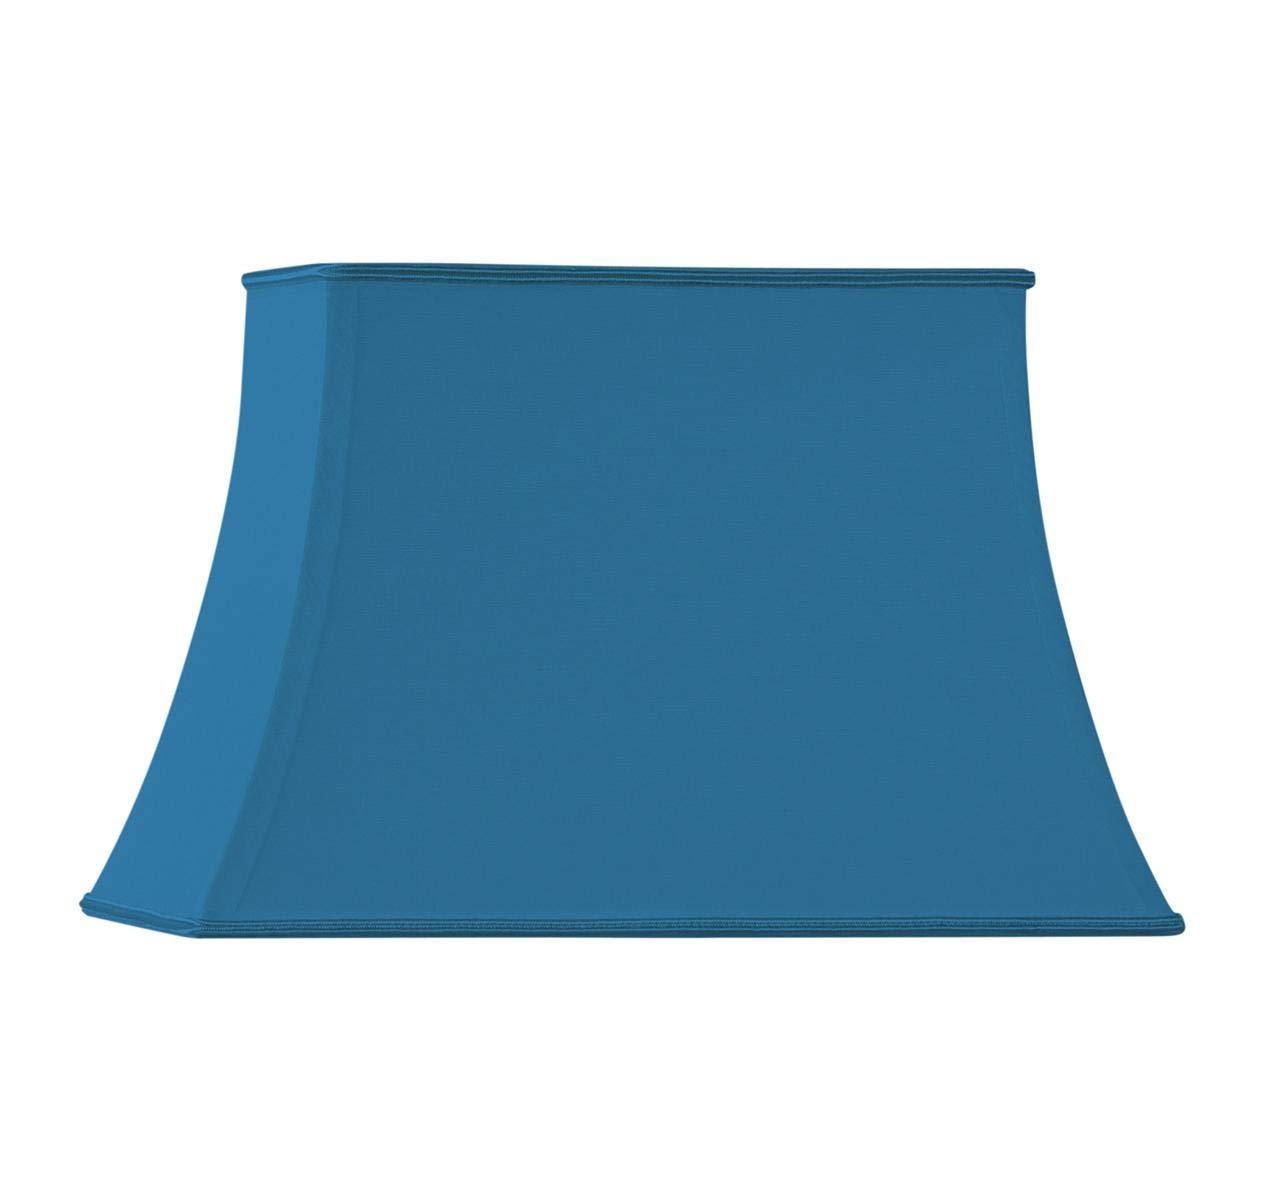 Hellblau 30 x 20 x 12//22 cm Lampenschirm in Form eines Pagode rechteckig